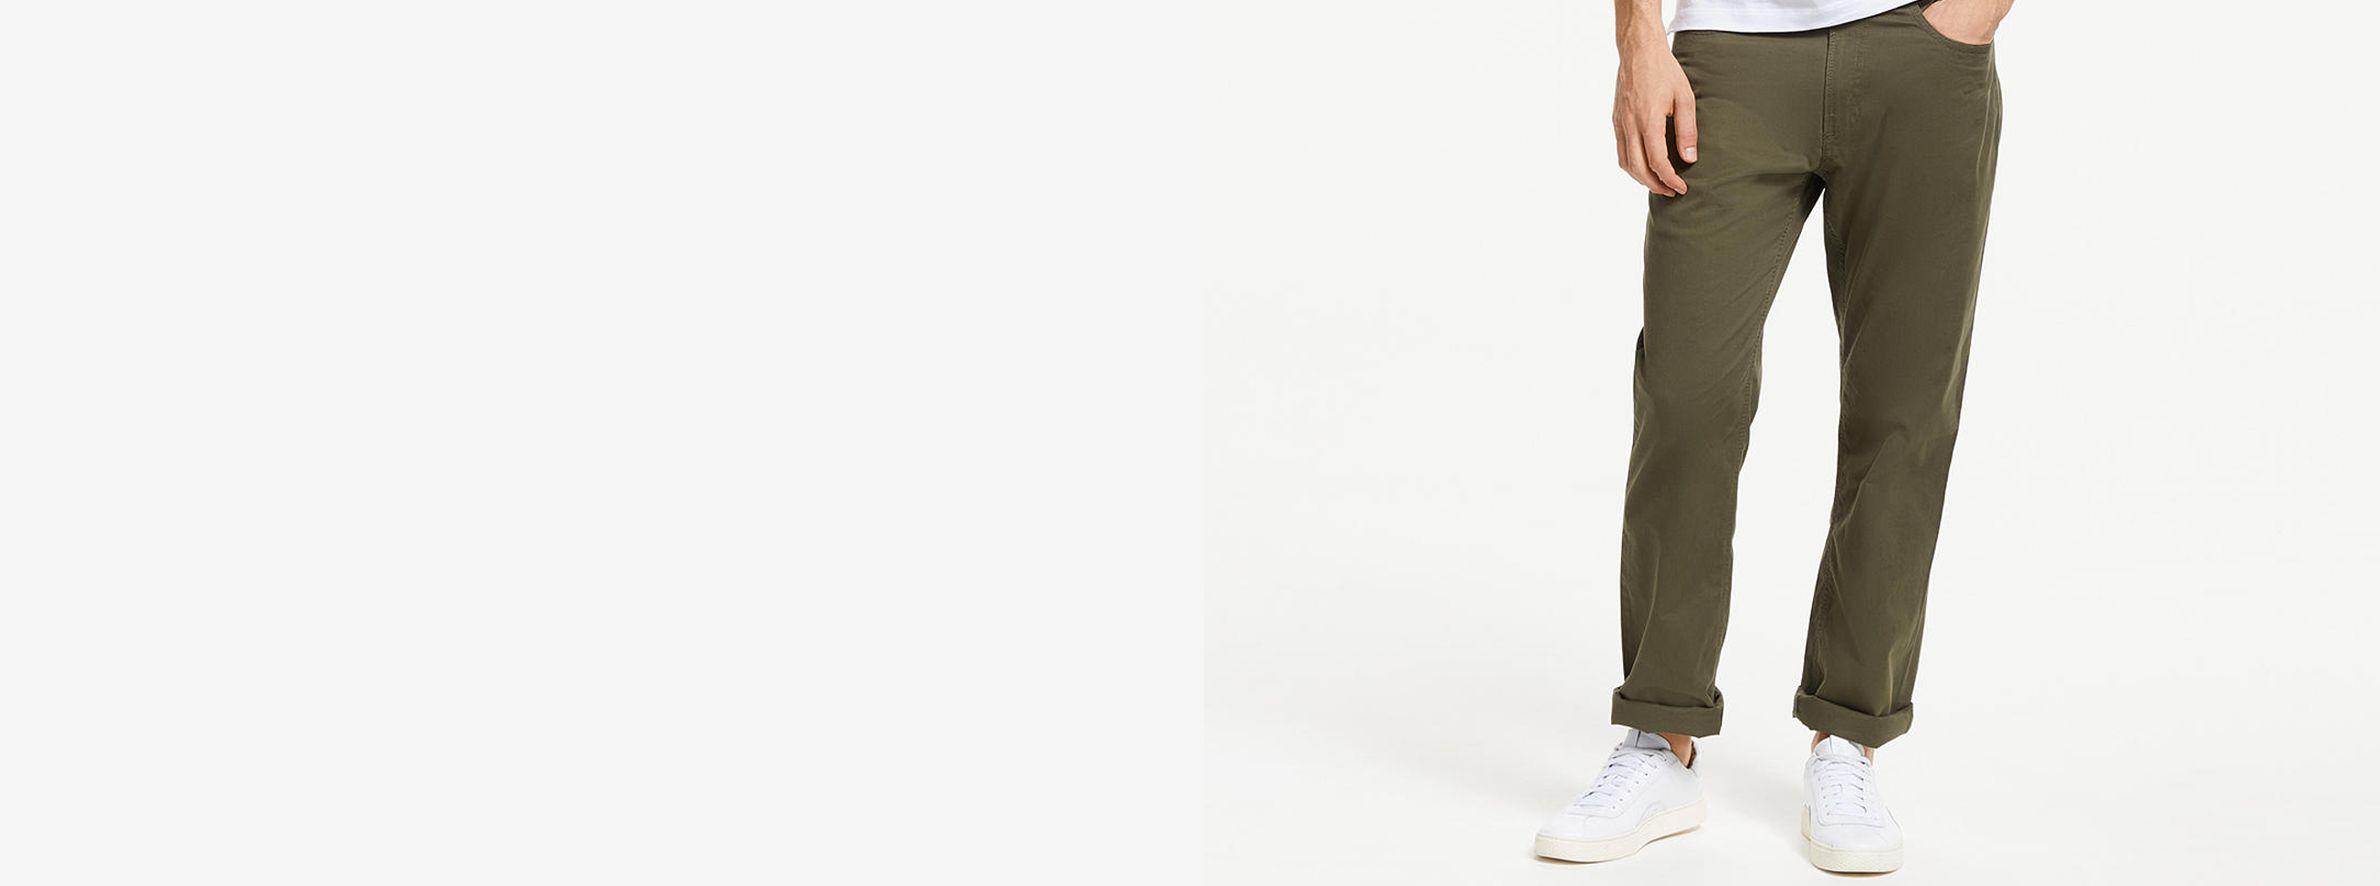 c8700ff7 Men's Trousers | Formal, Casual, Chinos, Smart | John Lewis